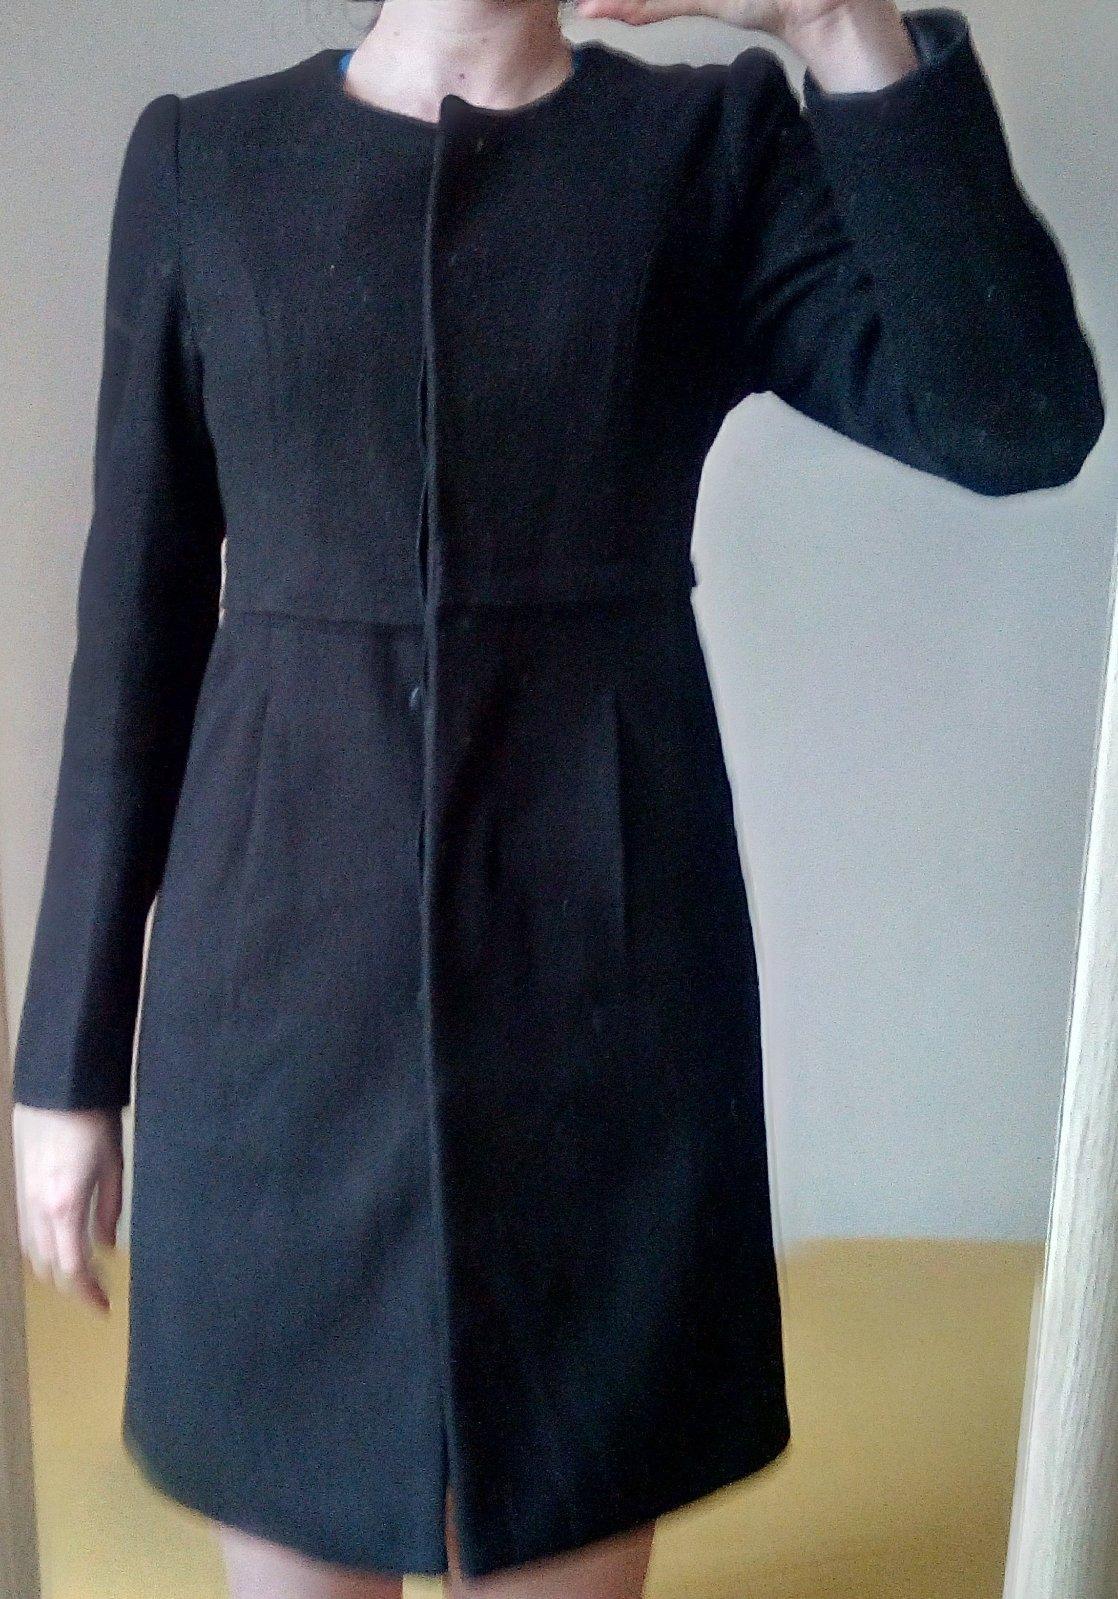 Čierny kabát/sako S - Obrázok č. 1